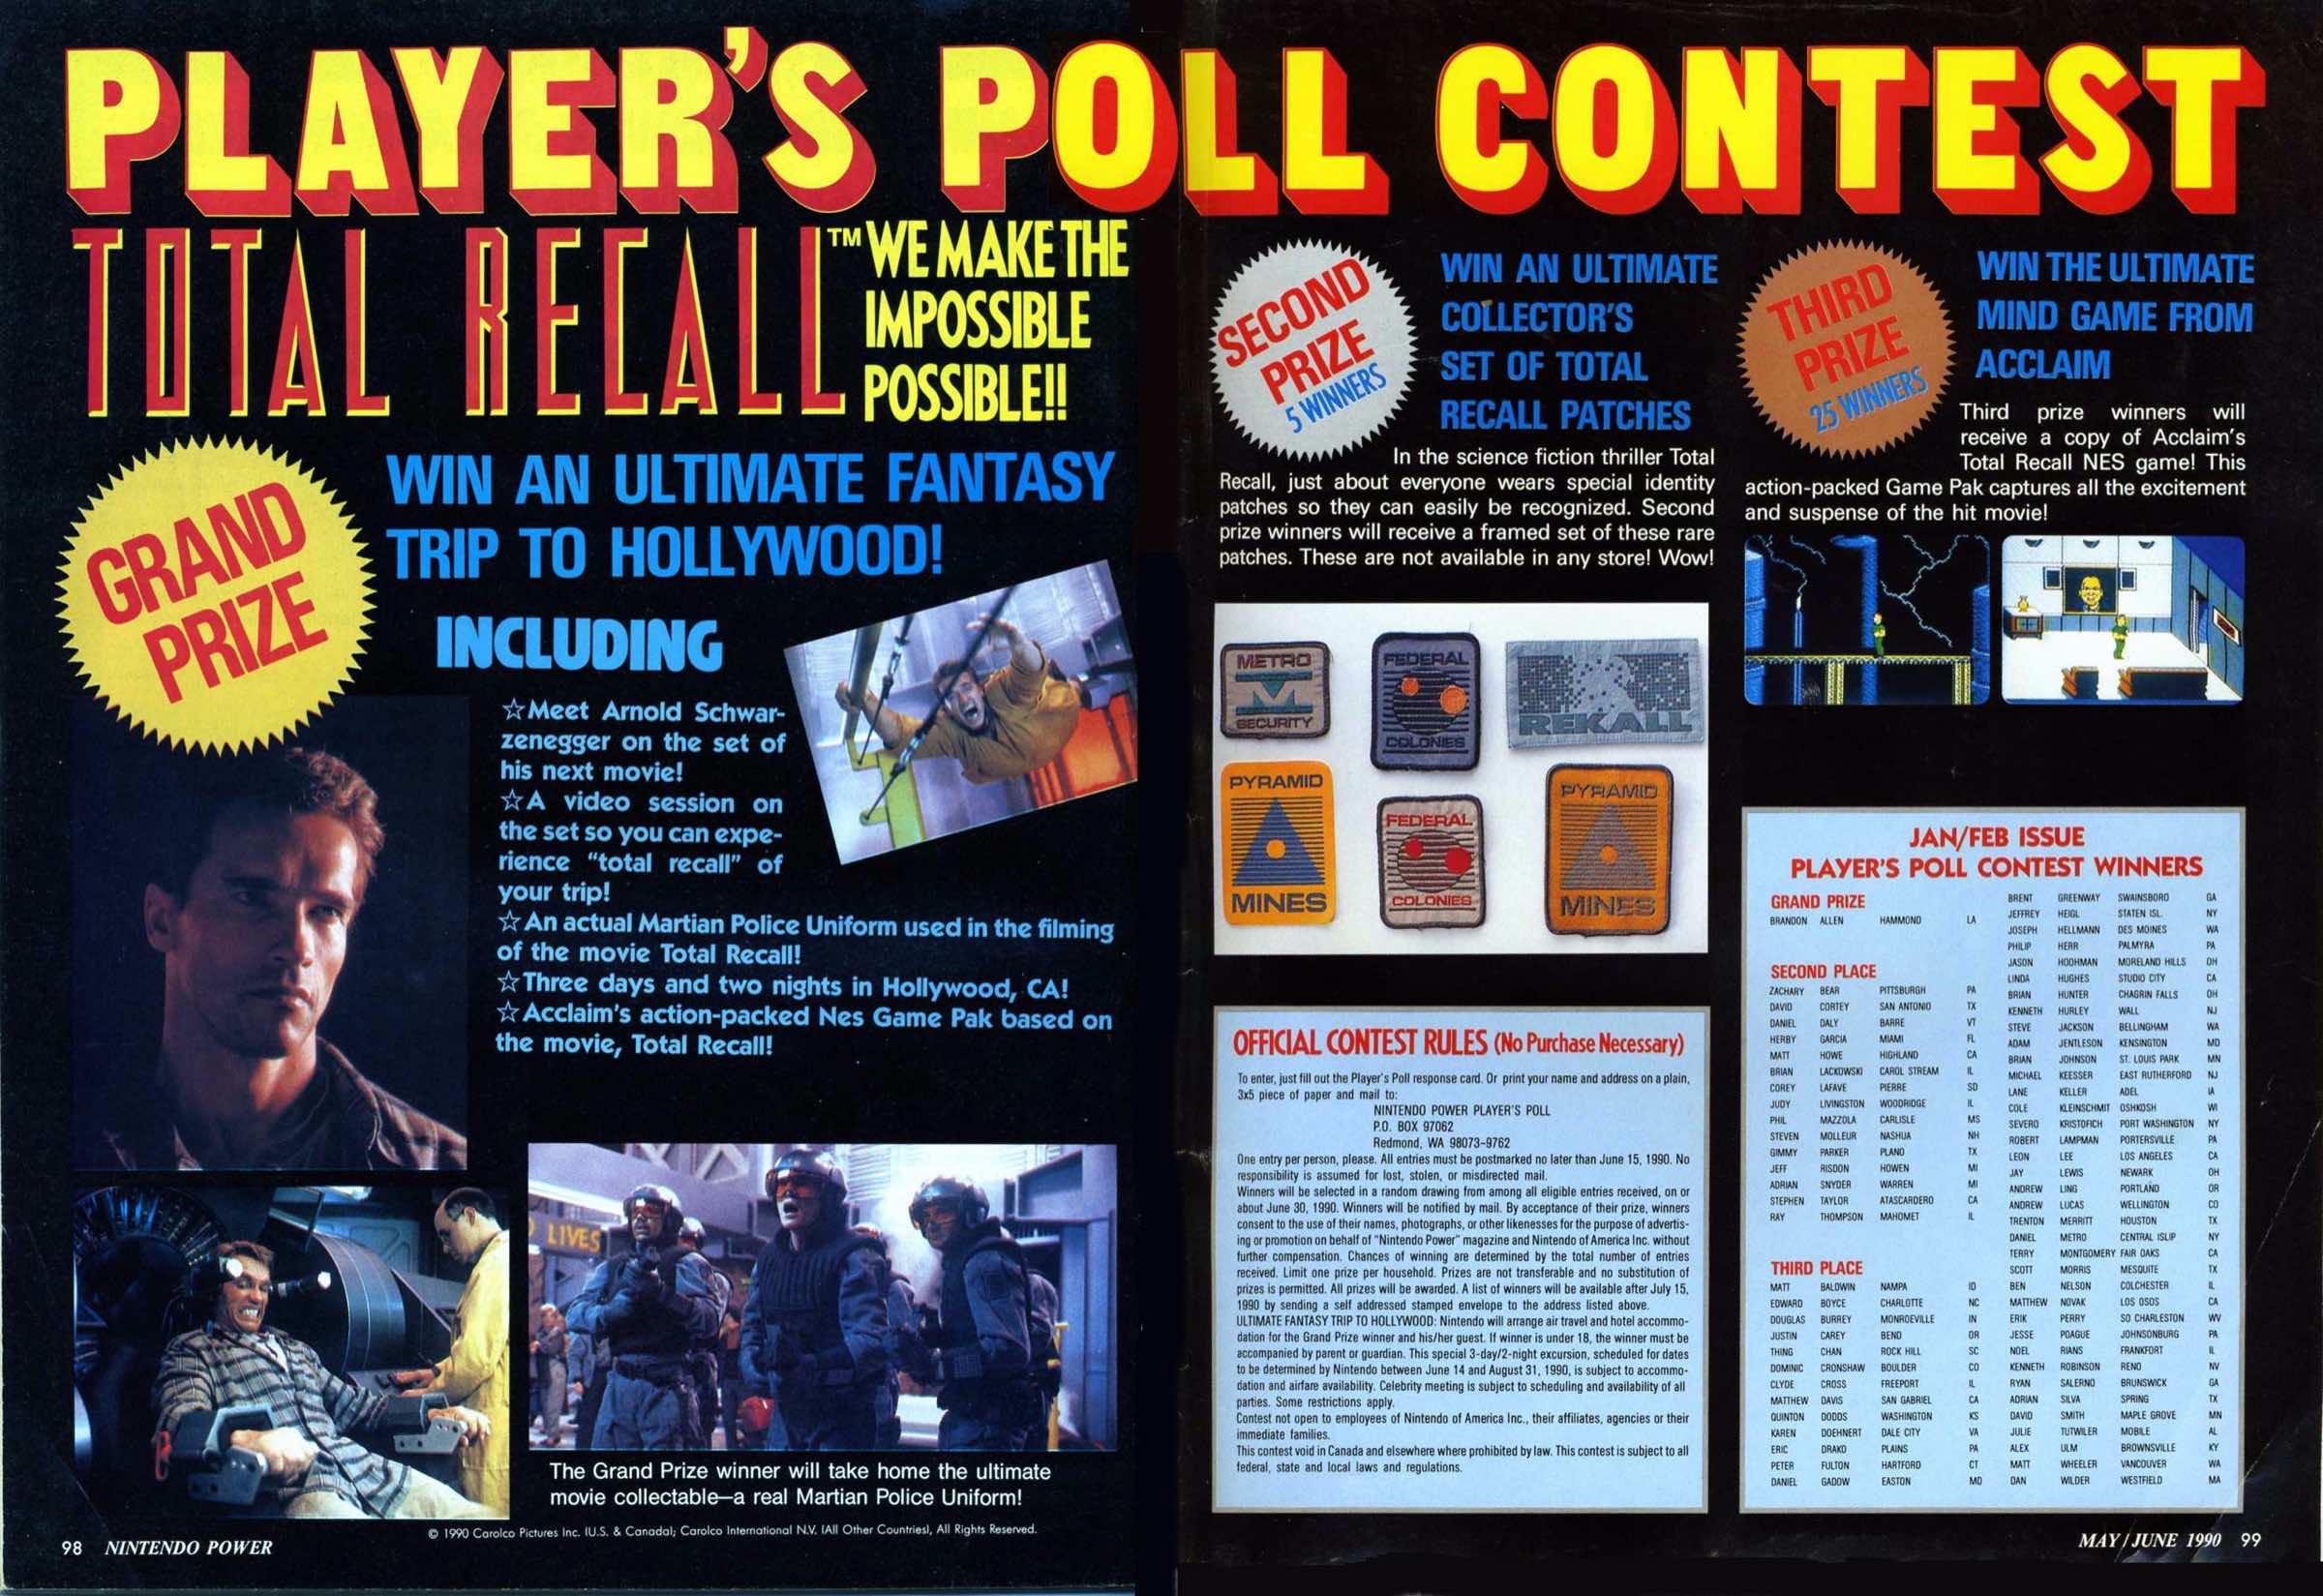 Nintendo Power | May June 1990 | p098-099